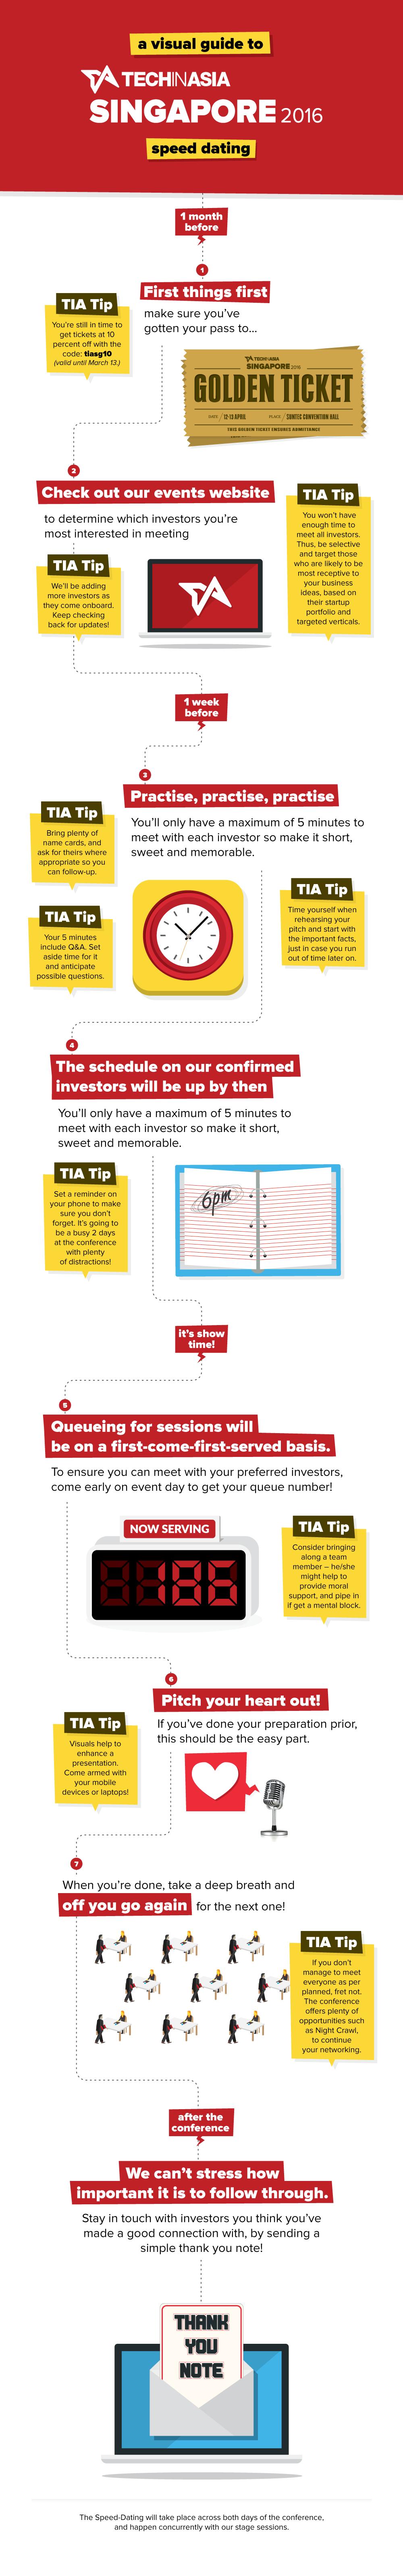 How you can meet over 60 investors at TIA SG 2016